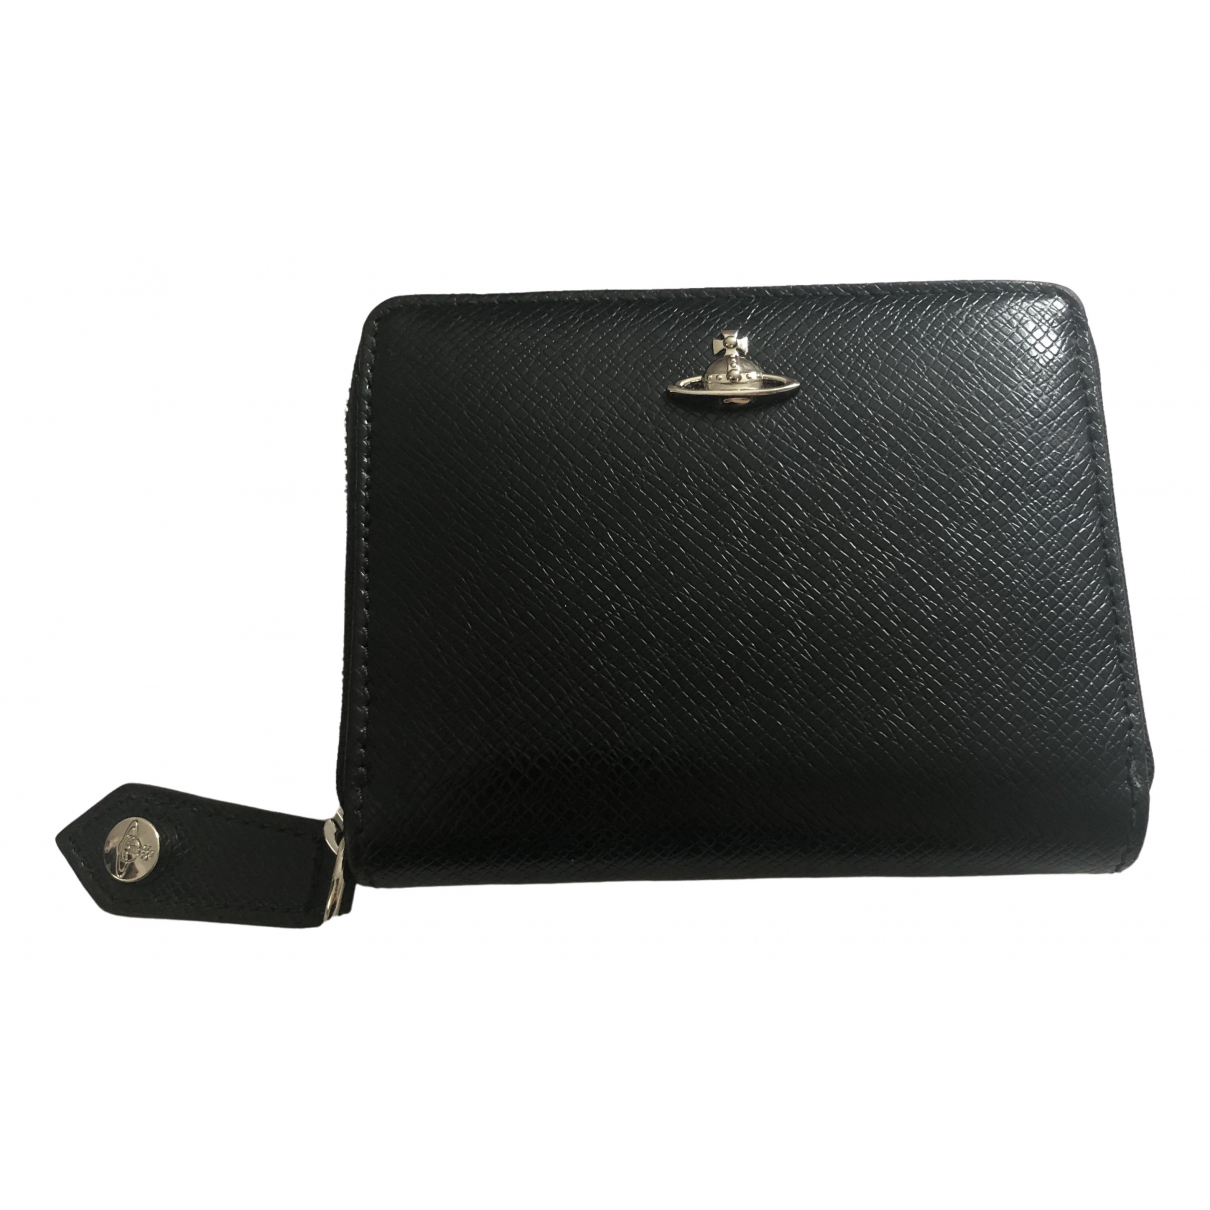 Vivienne Westwood \N Black Leather Purses, wallet & cases for Women \N